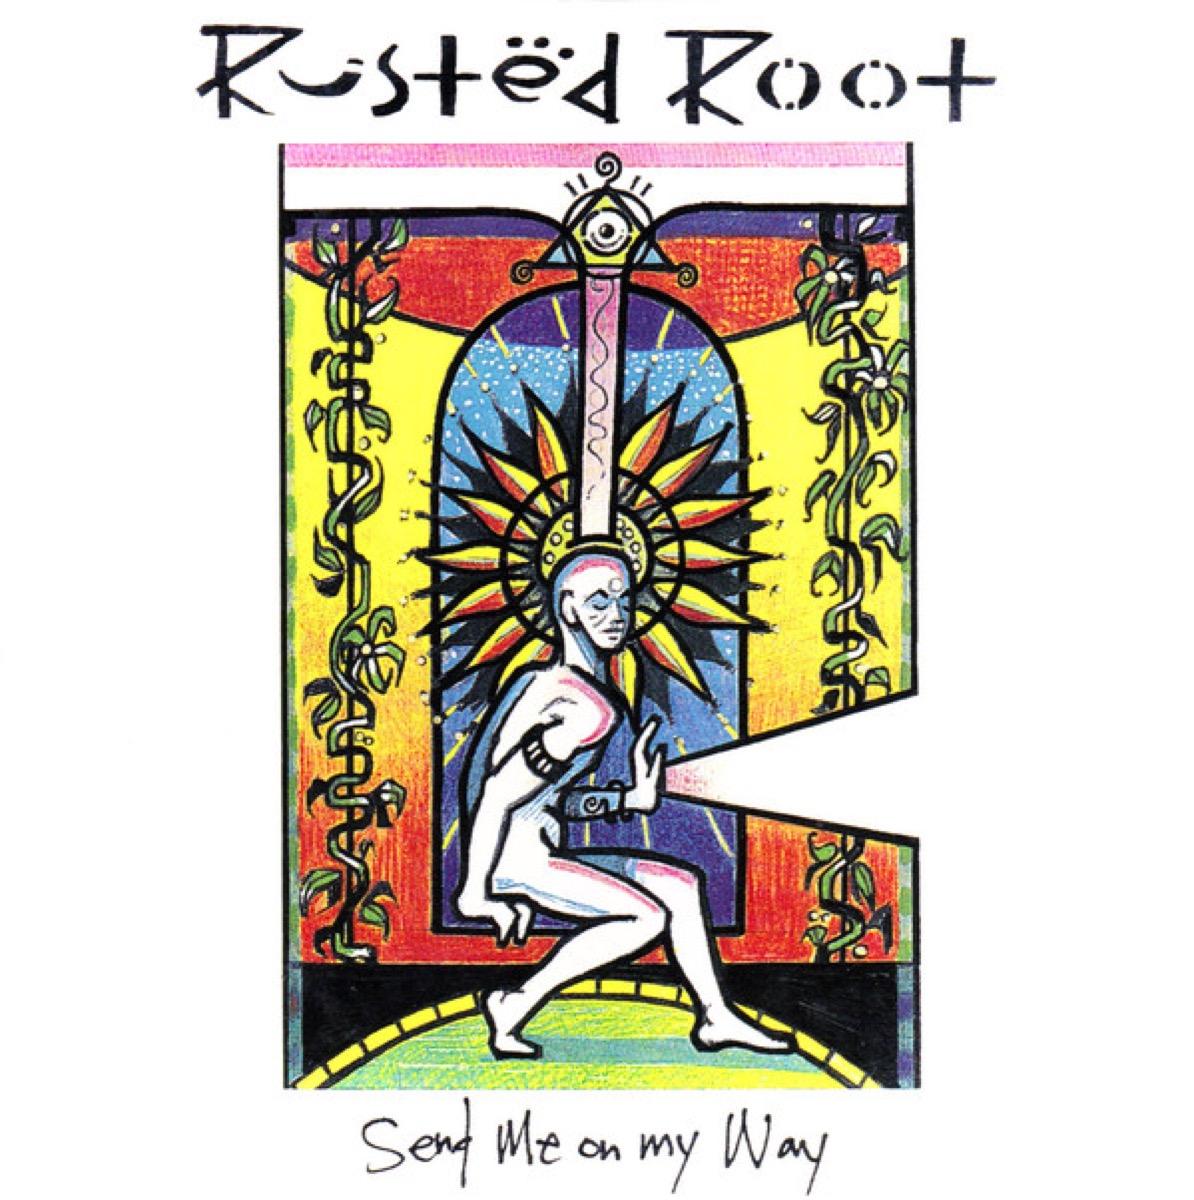 Send Me On My Way by Rusted Root Best One-Hit Wonders